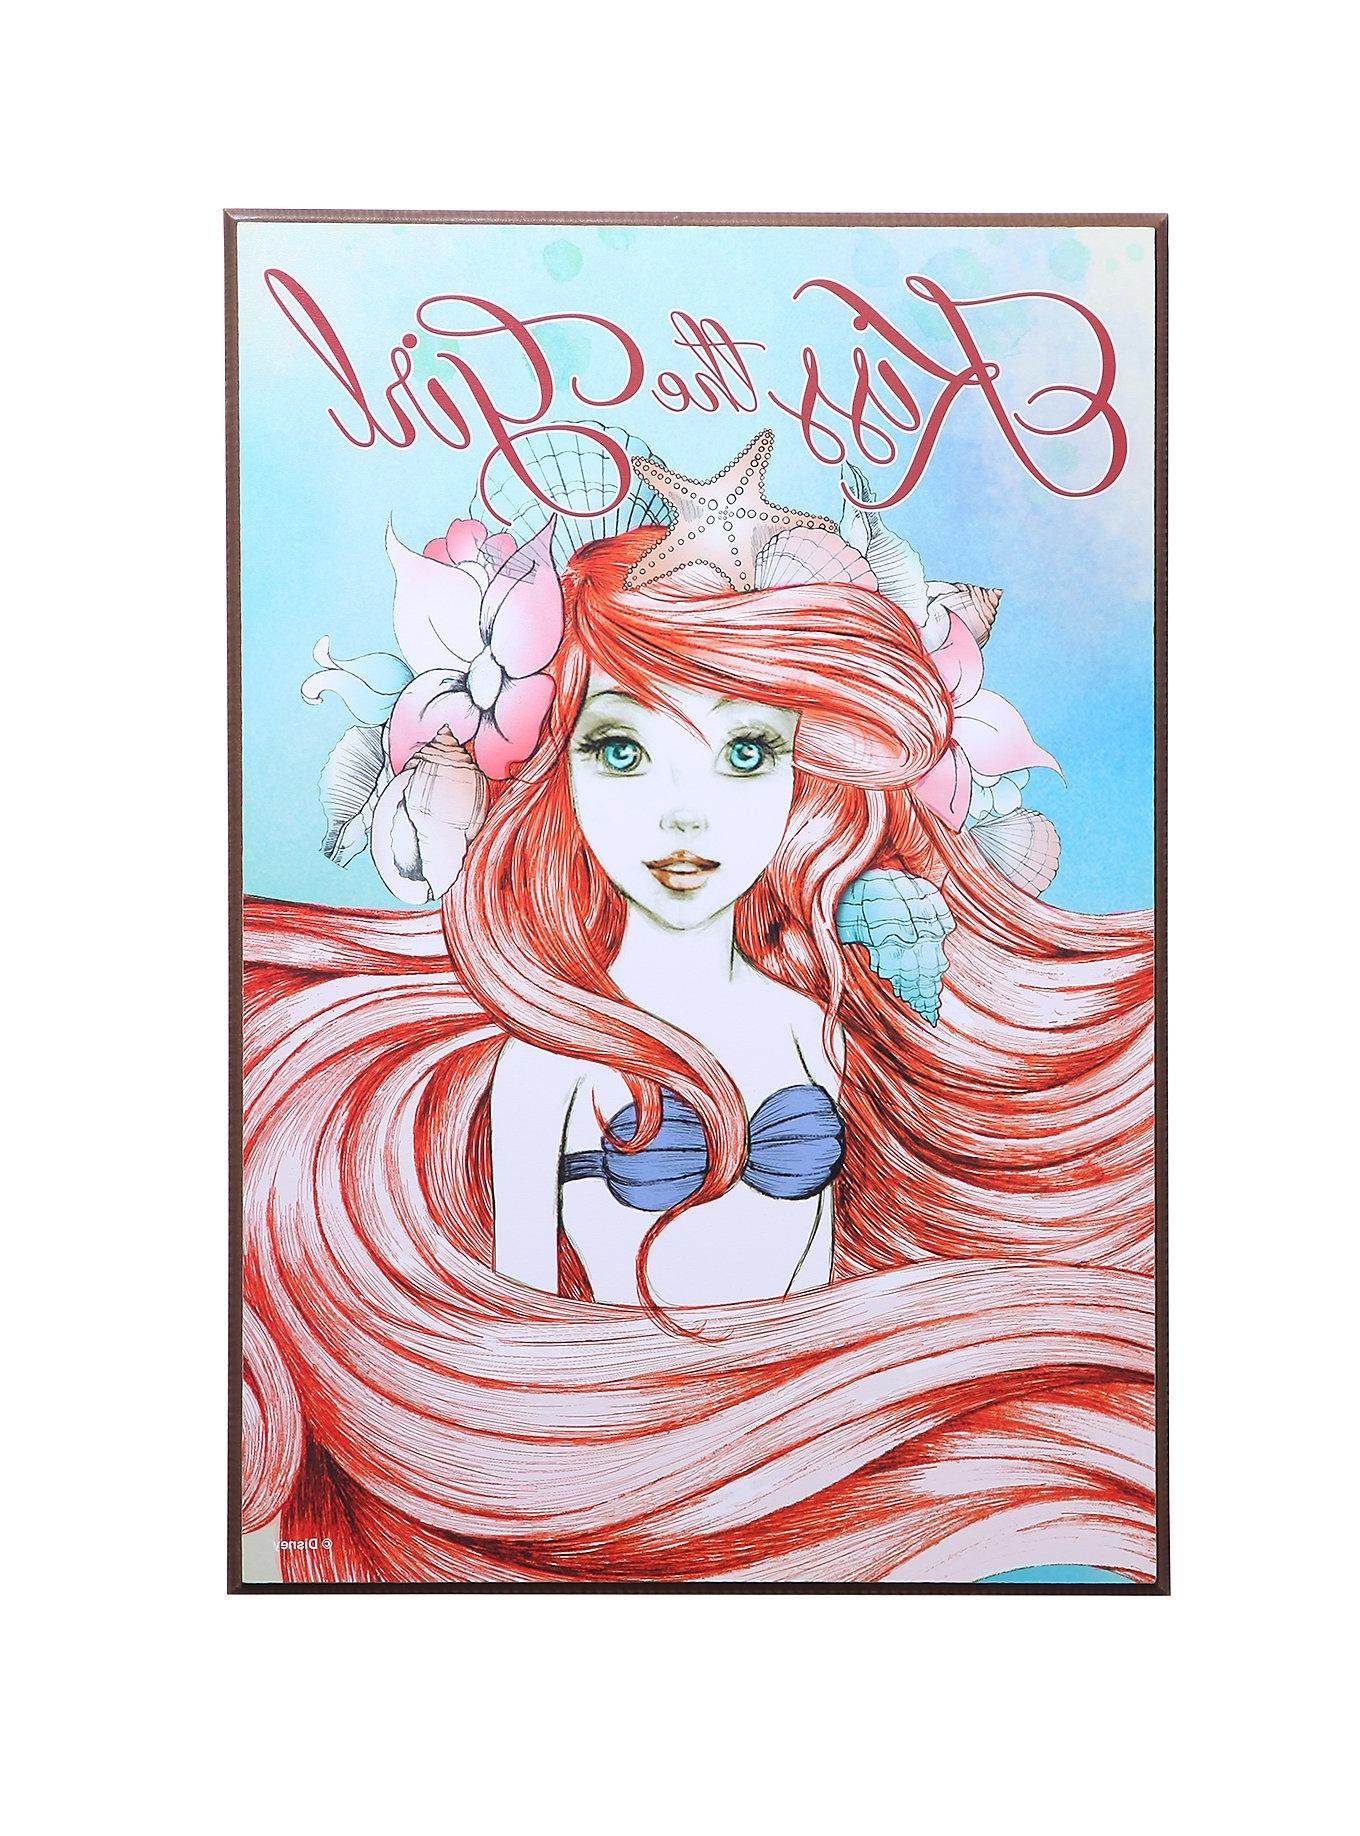 2018 Mermaid Wood Wall Art For Wall Art Decor Ideas: Kiss The Girl Little Mermaid Wall Art Wooden (View 8 of 15)